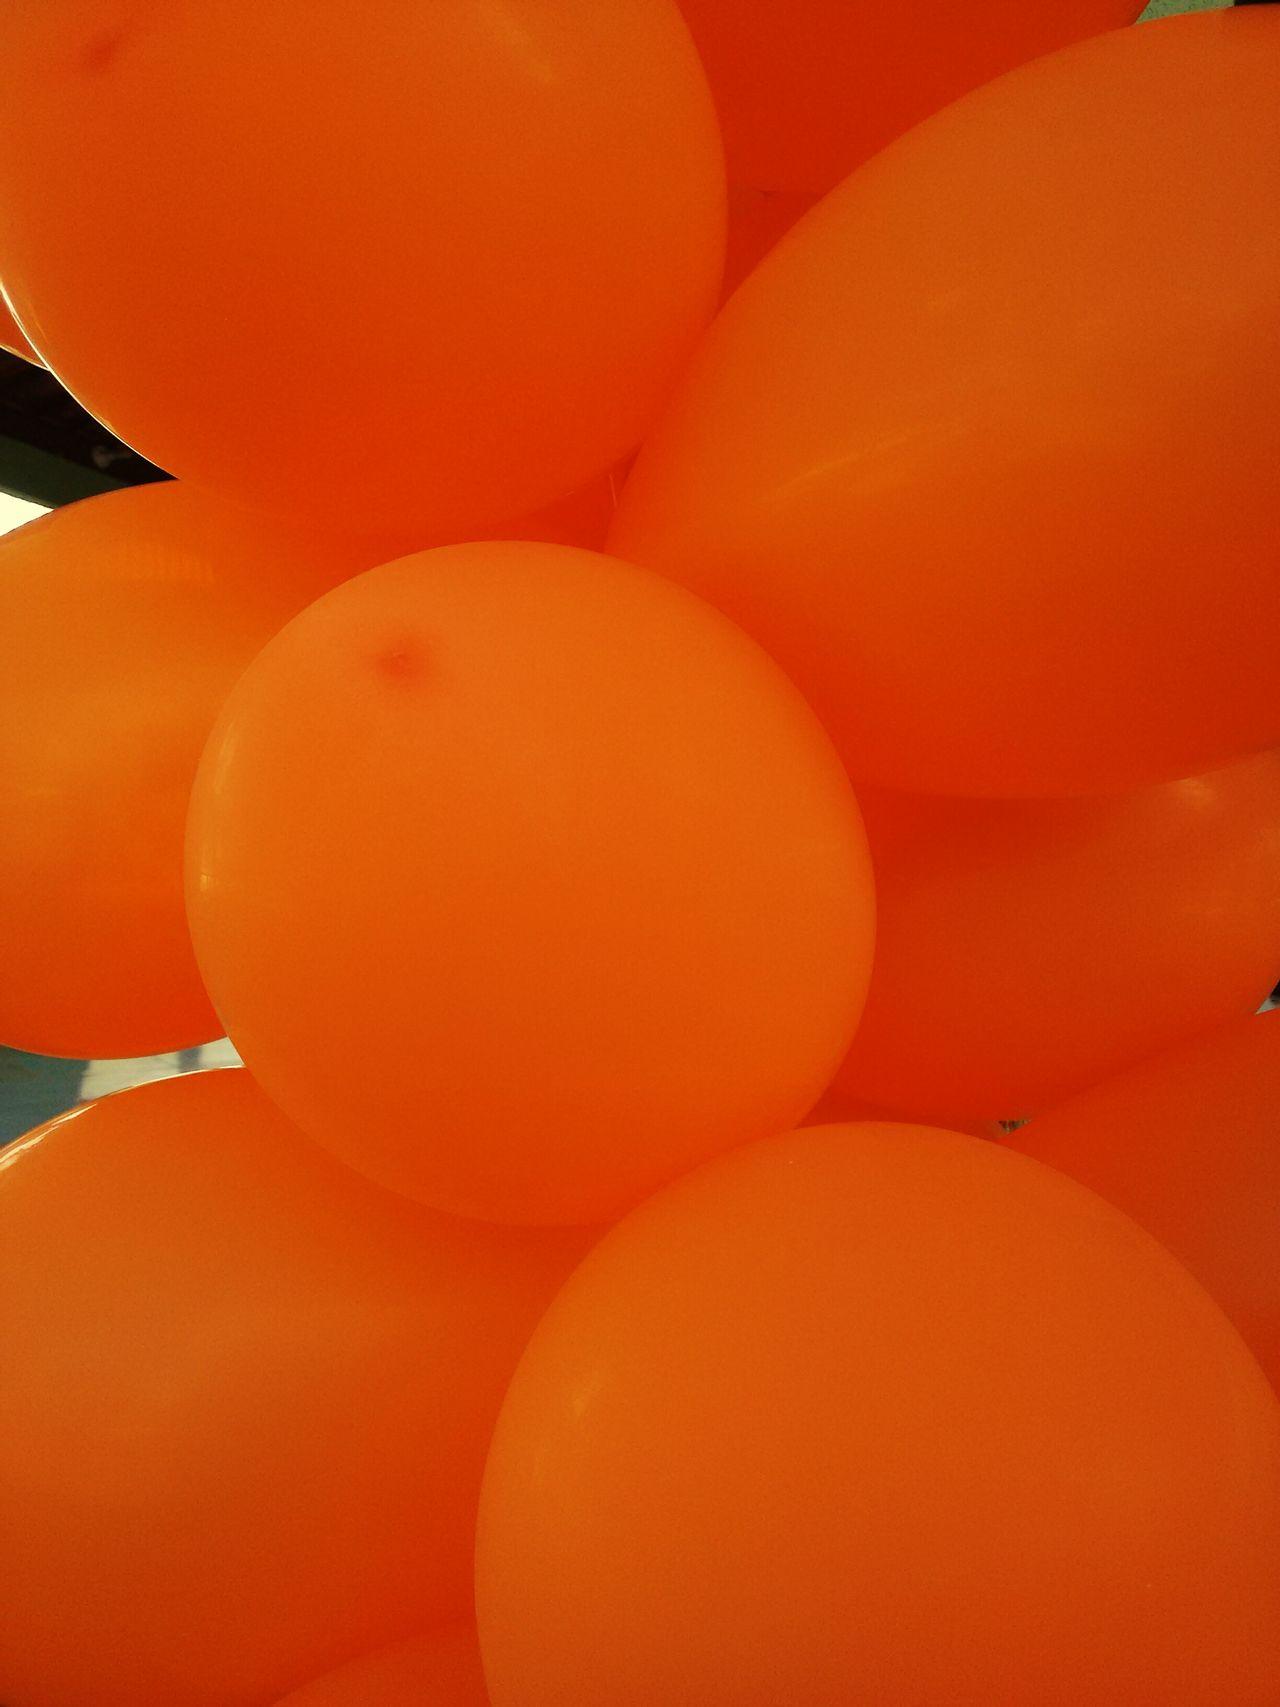 🎈🎈🎈 Hello World Orange Color Balloons No People Balls Close-up Joy Simplicity I LOVE PHOTOGRAPHY EyeEm Gallery EyeEm Best Shots EyeEmBestPics Brazilian Gallery Brasil Brazil 💚💚💚🎈🎈🎈🌍💋✌